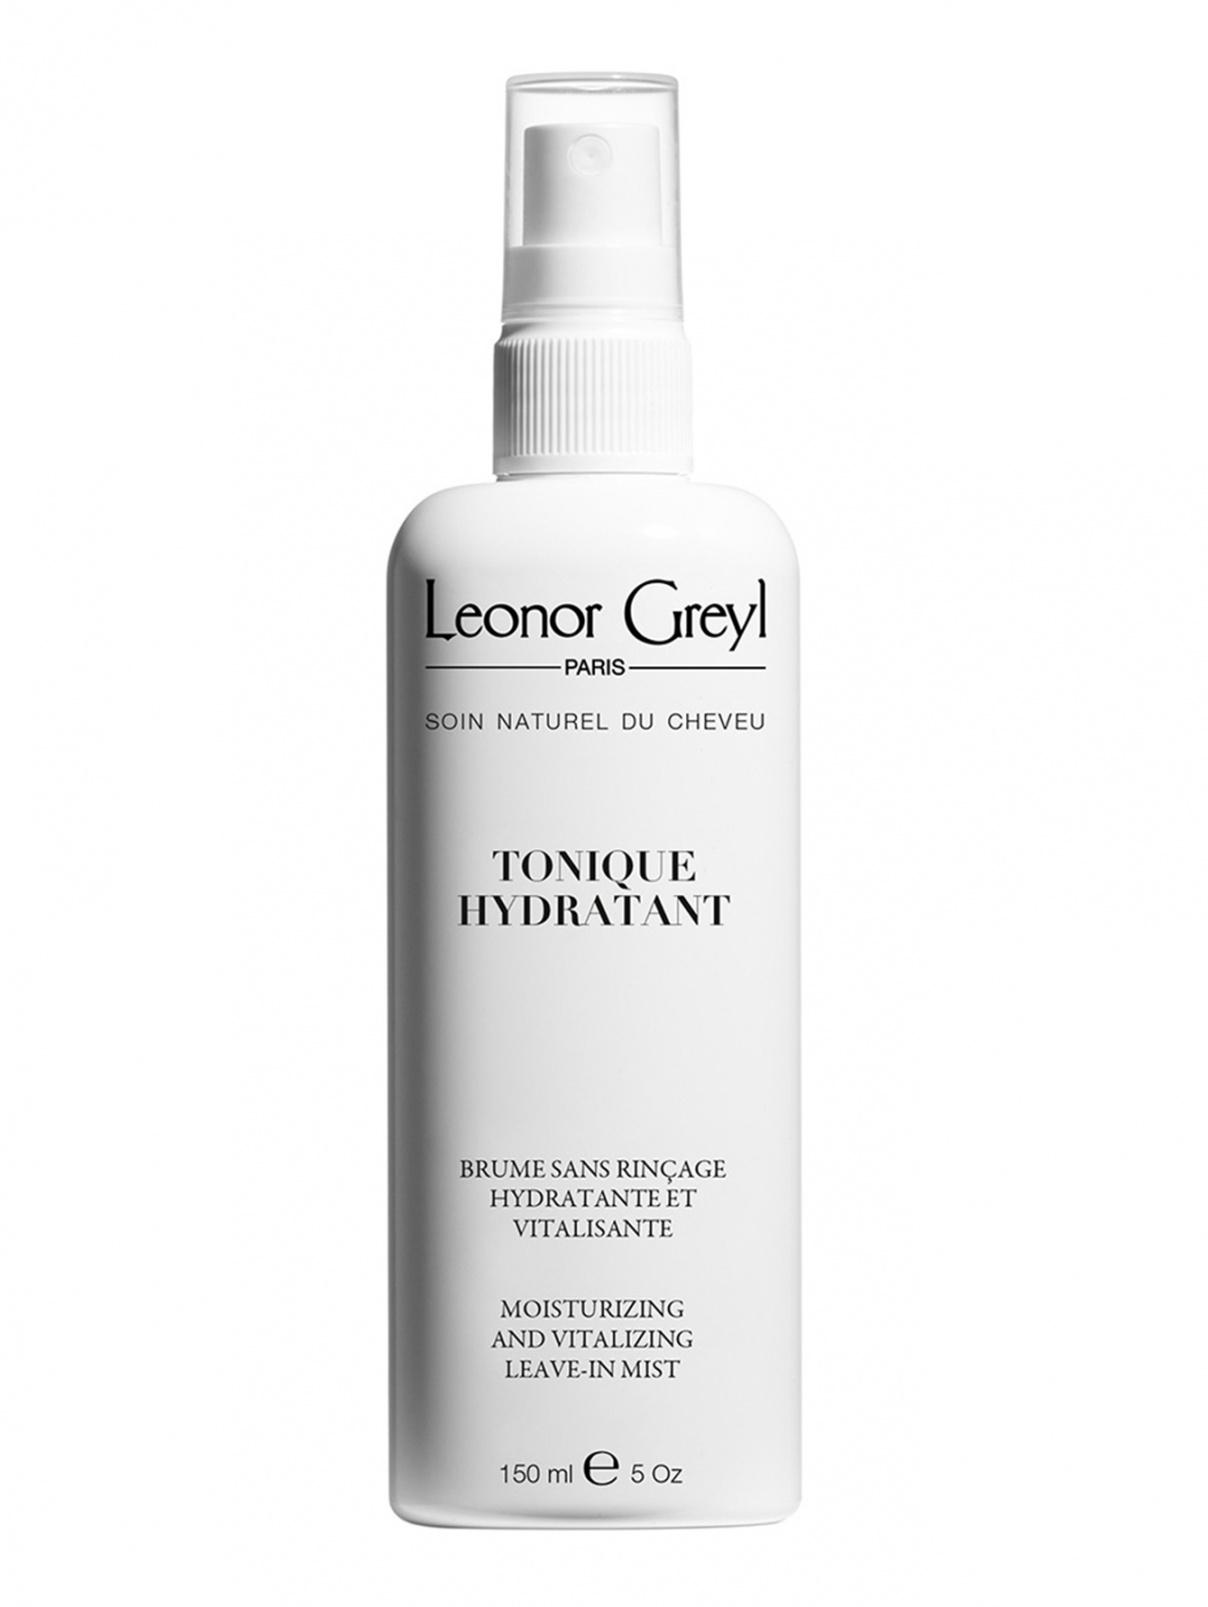 Увлажняющий тоник для волос - Hair Care, 150ml Leonor Greyl  –  Общий вид